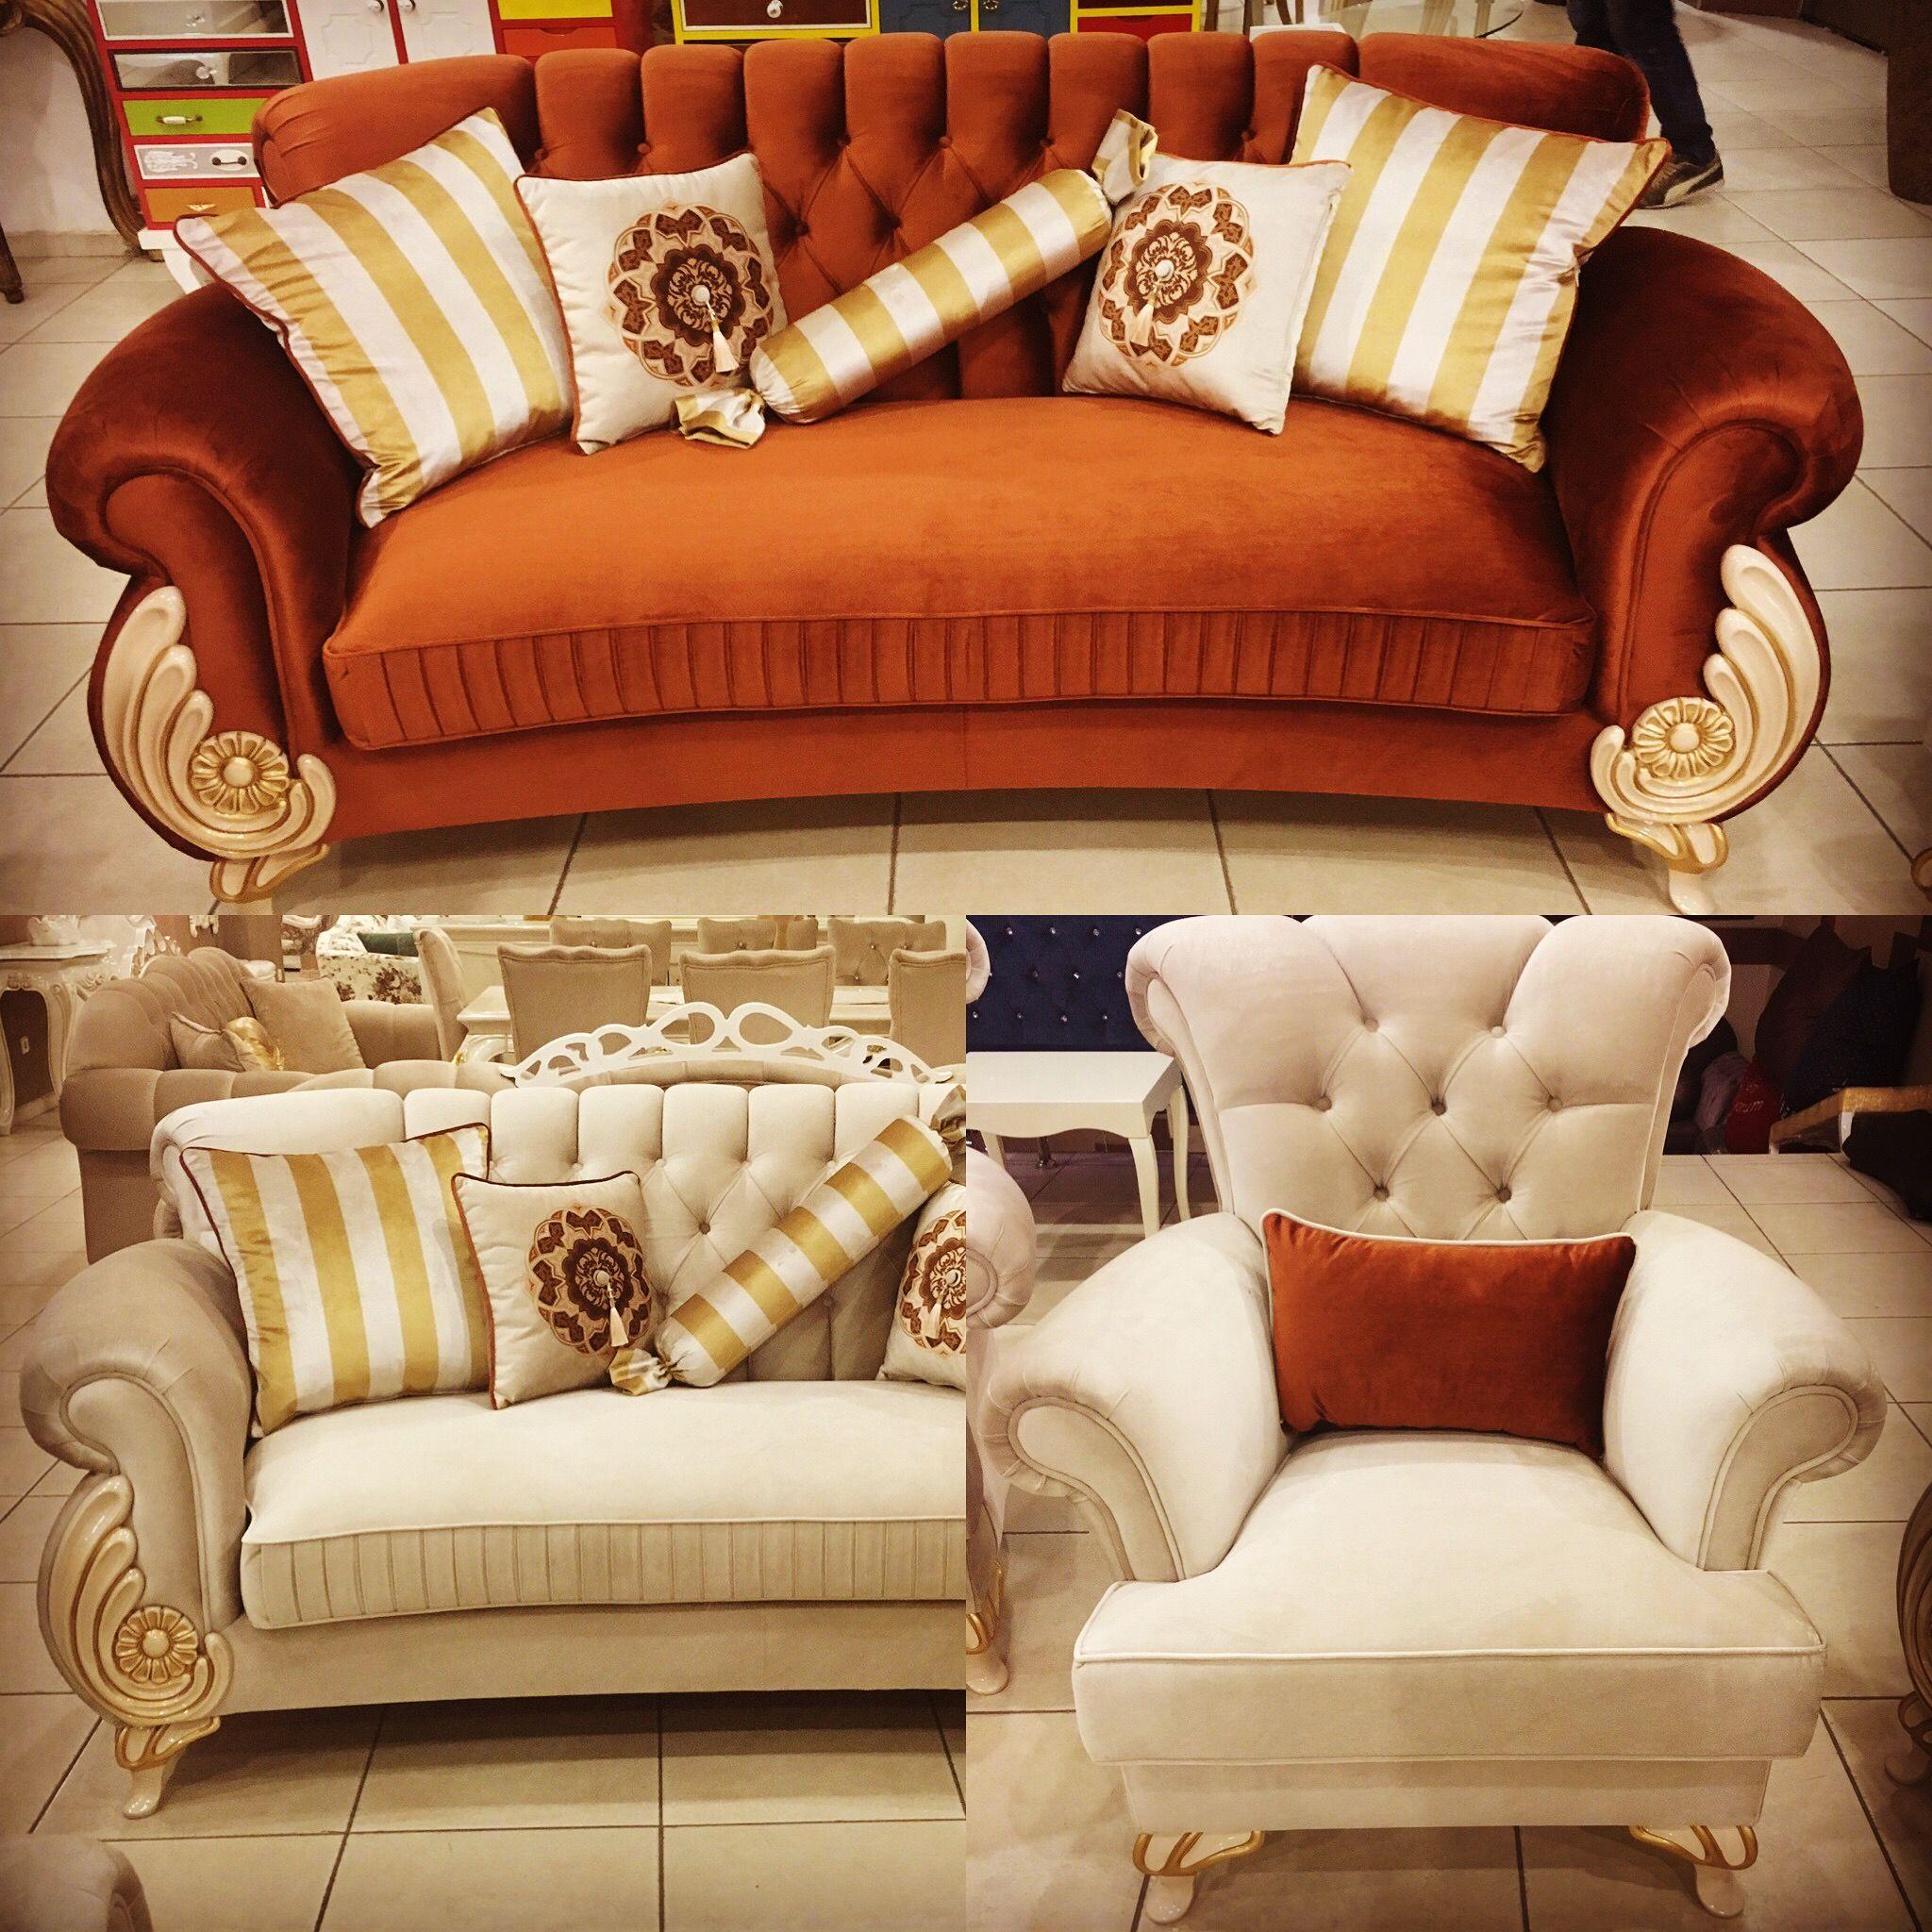 Avellino neo classic luxury Italian sofa set $6 895 neoclassic